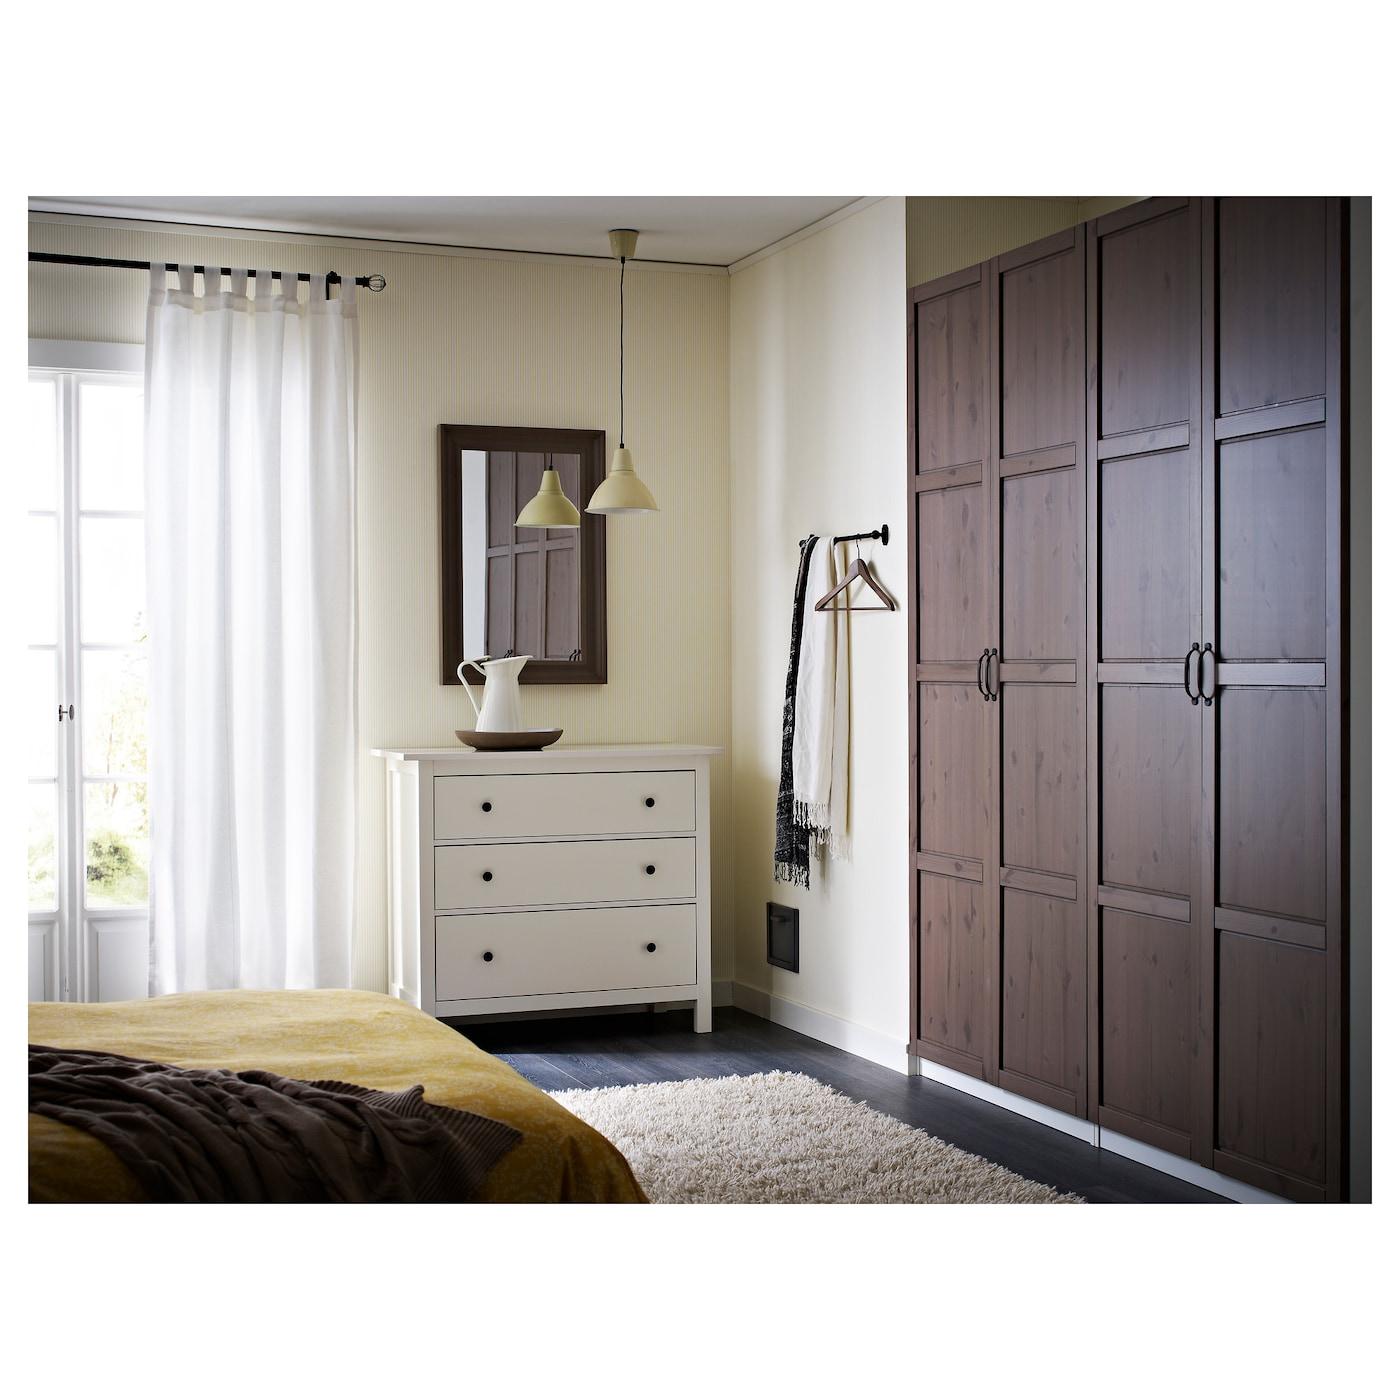 hemnes spiegel zwartbruin 60 x 90 cm ikea. Black Bedroom Furniture Sets. Home Design Ideas